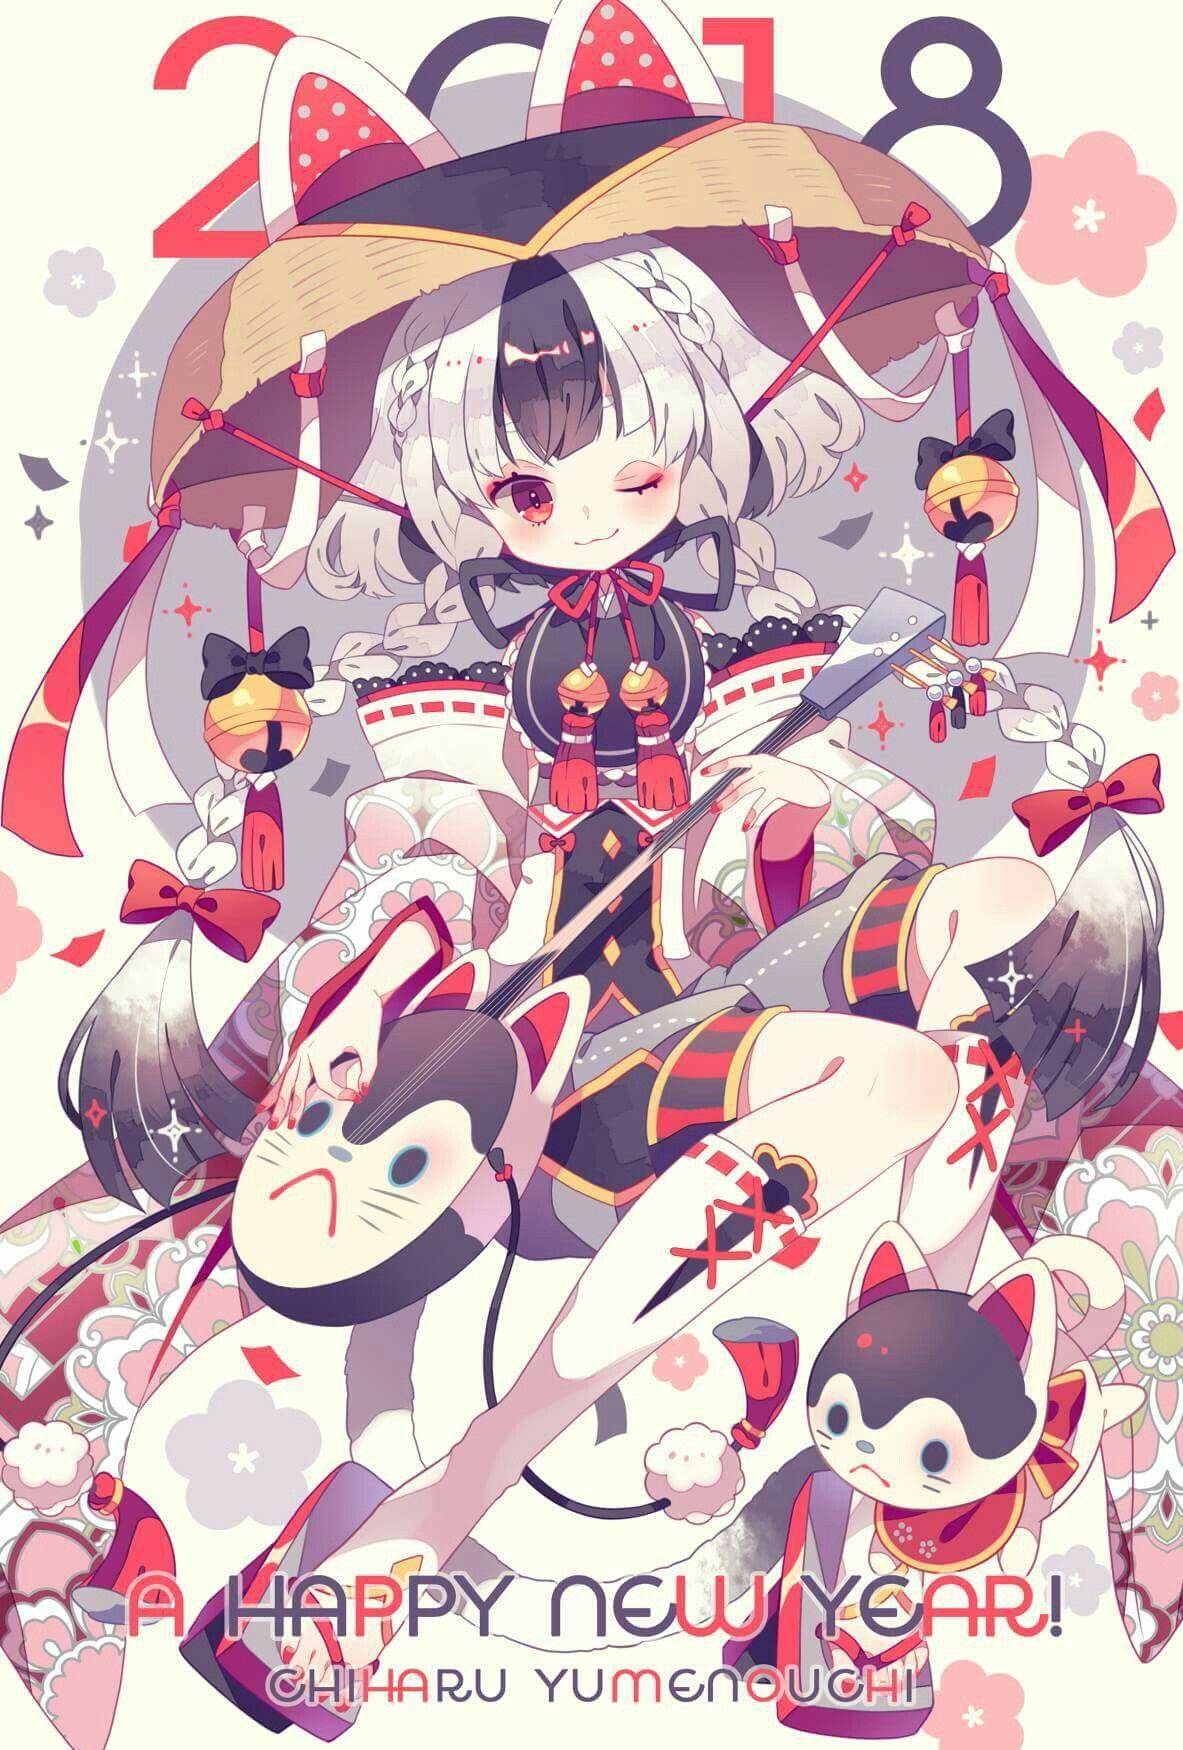 Happy new year 9  Anime, Anime art girl, New year anime